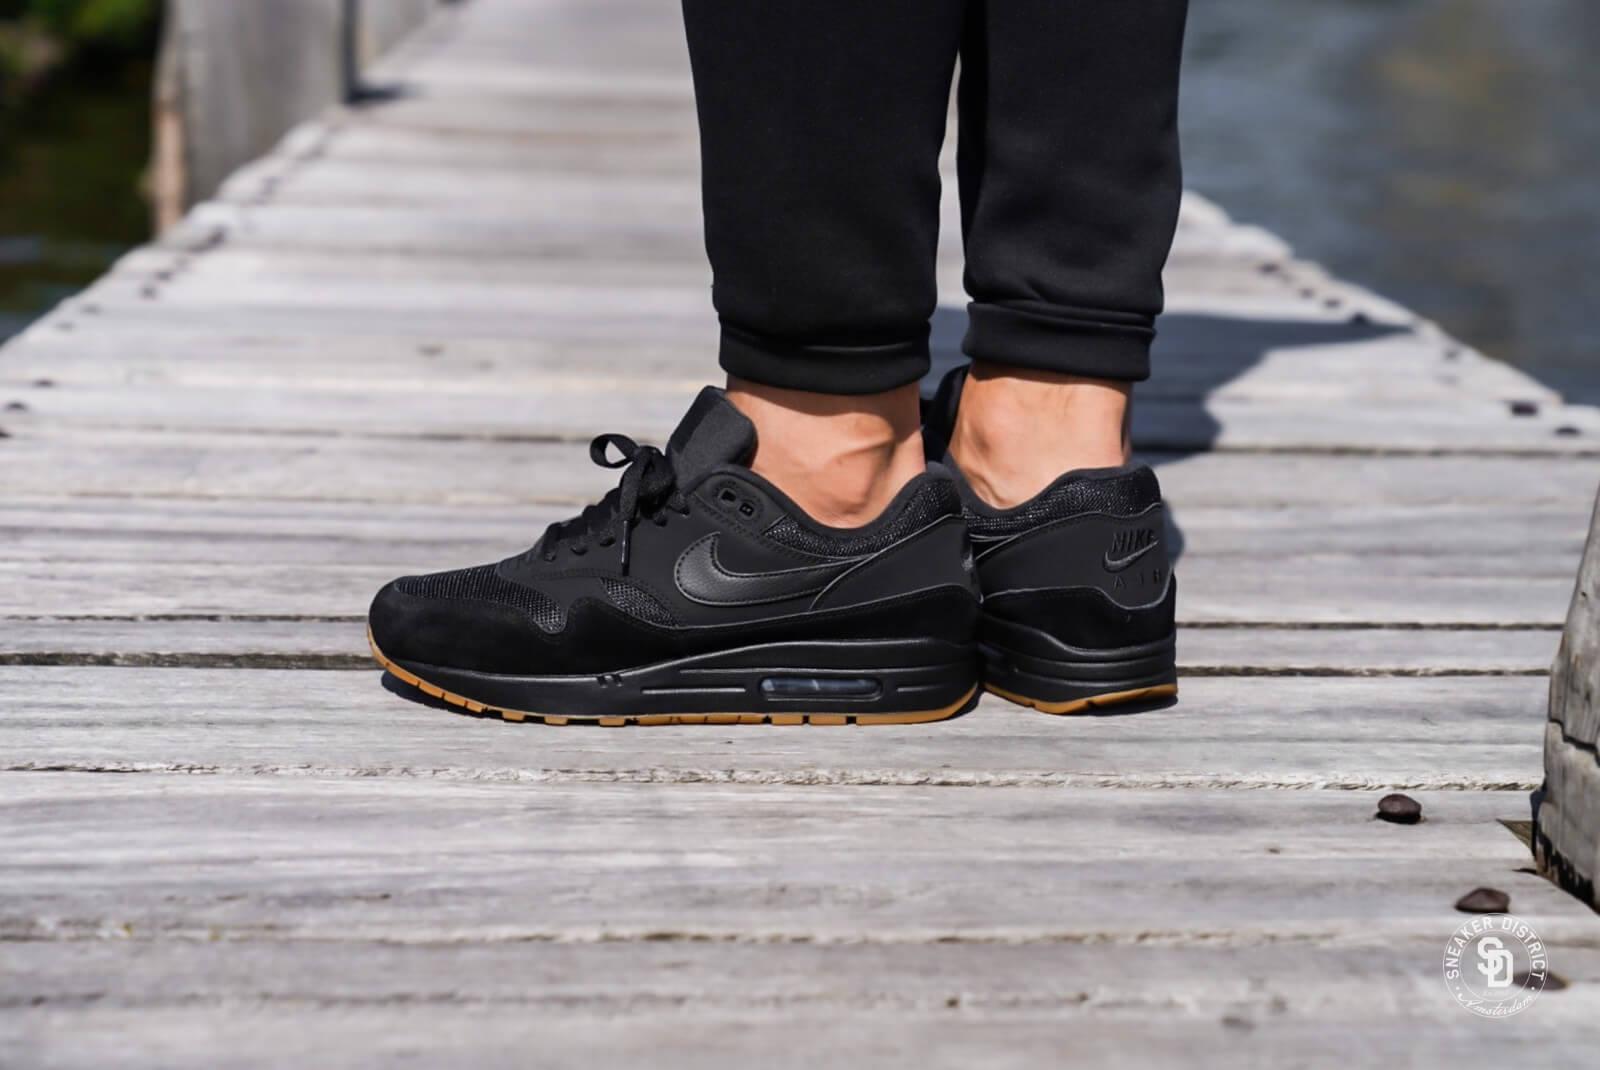 Norway Gum Shox Nike 109ac Sort 5f843 IWHeD2E9Y